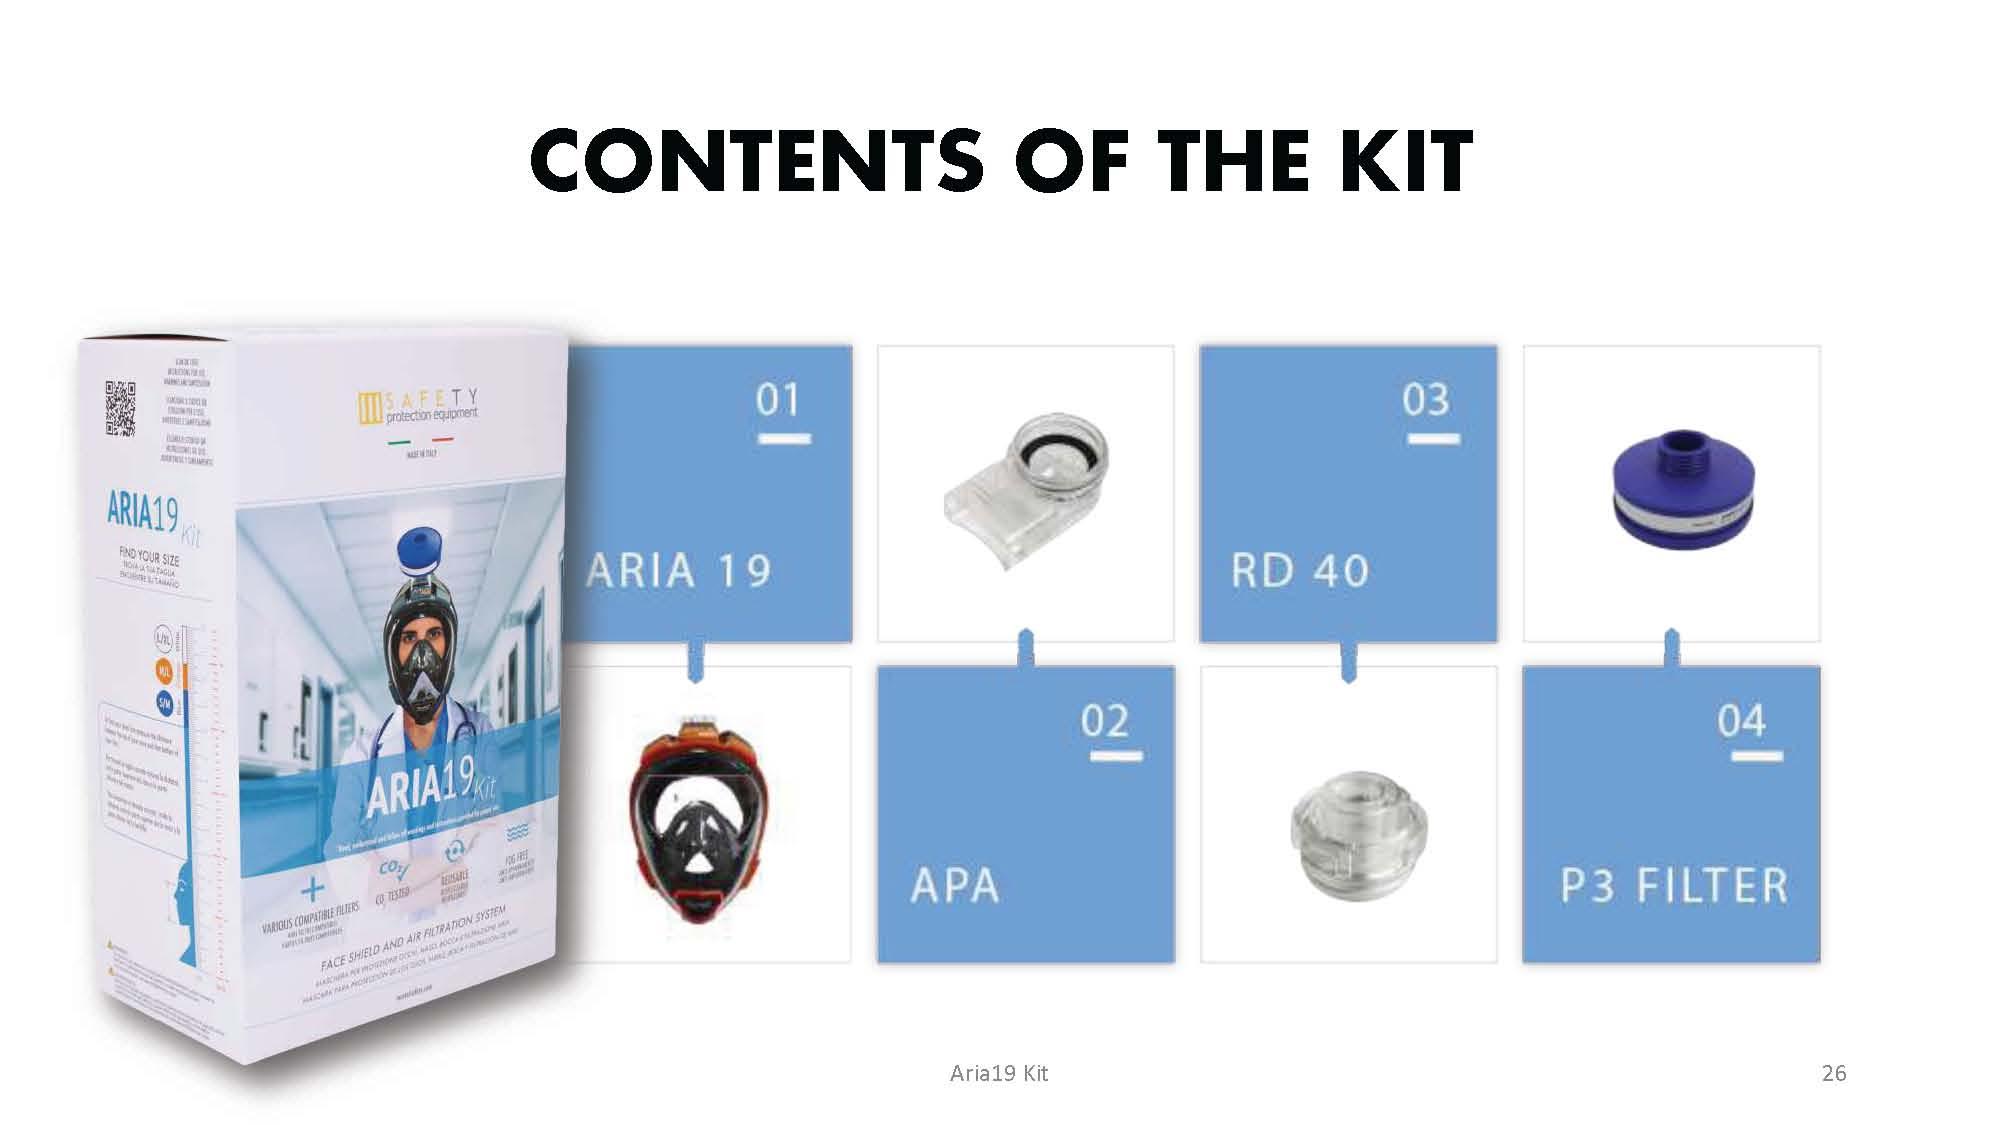 aria19-kit-1-page-26.jpg